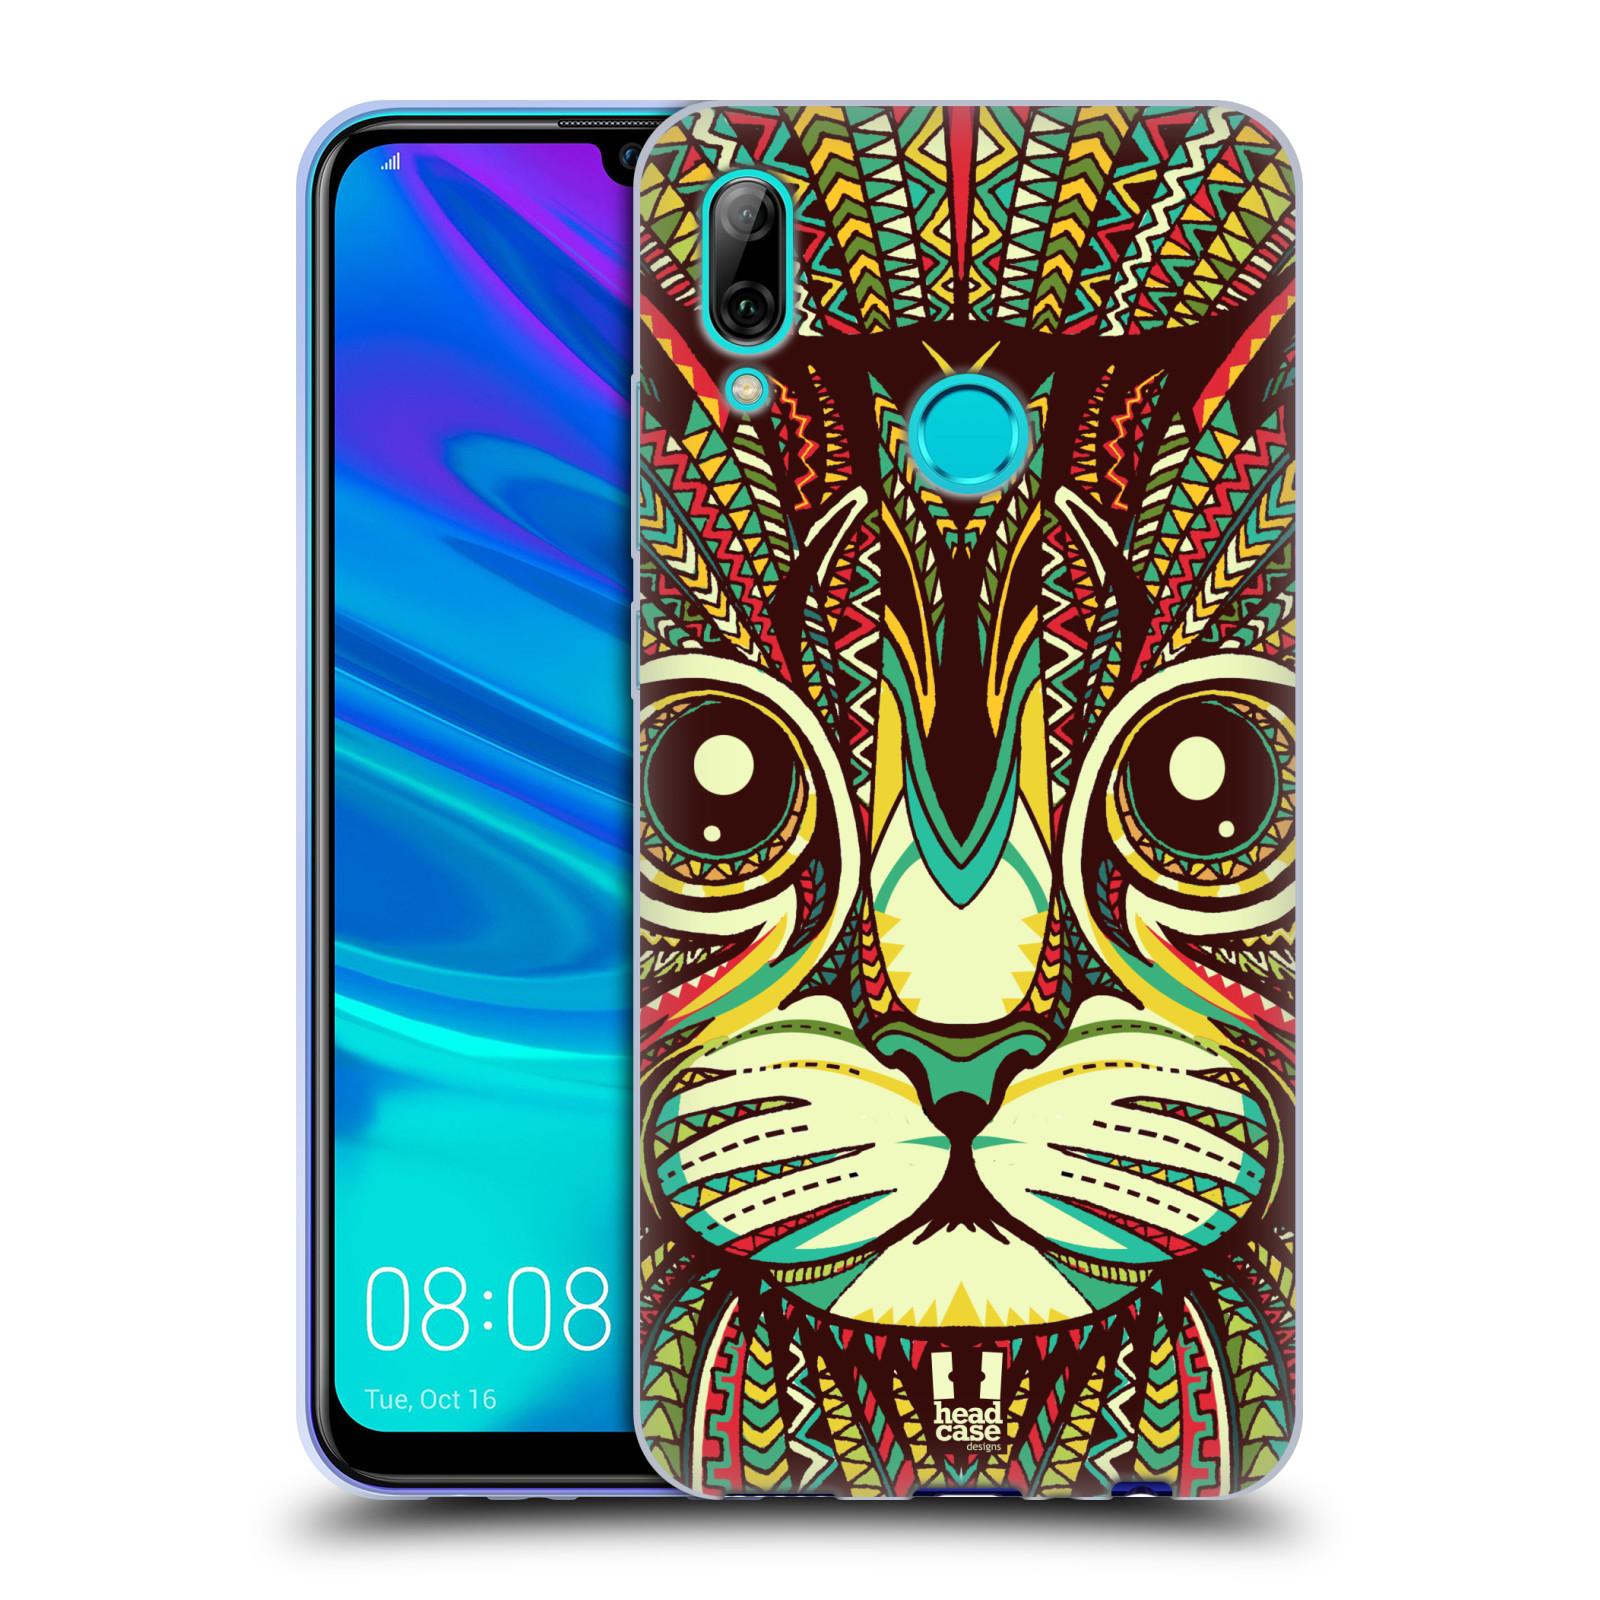 Silikonové pouzdro na mobil Huawei P Smart (2019) - Head Case - AZTEC KOČKA